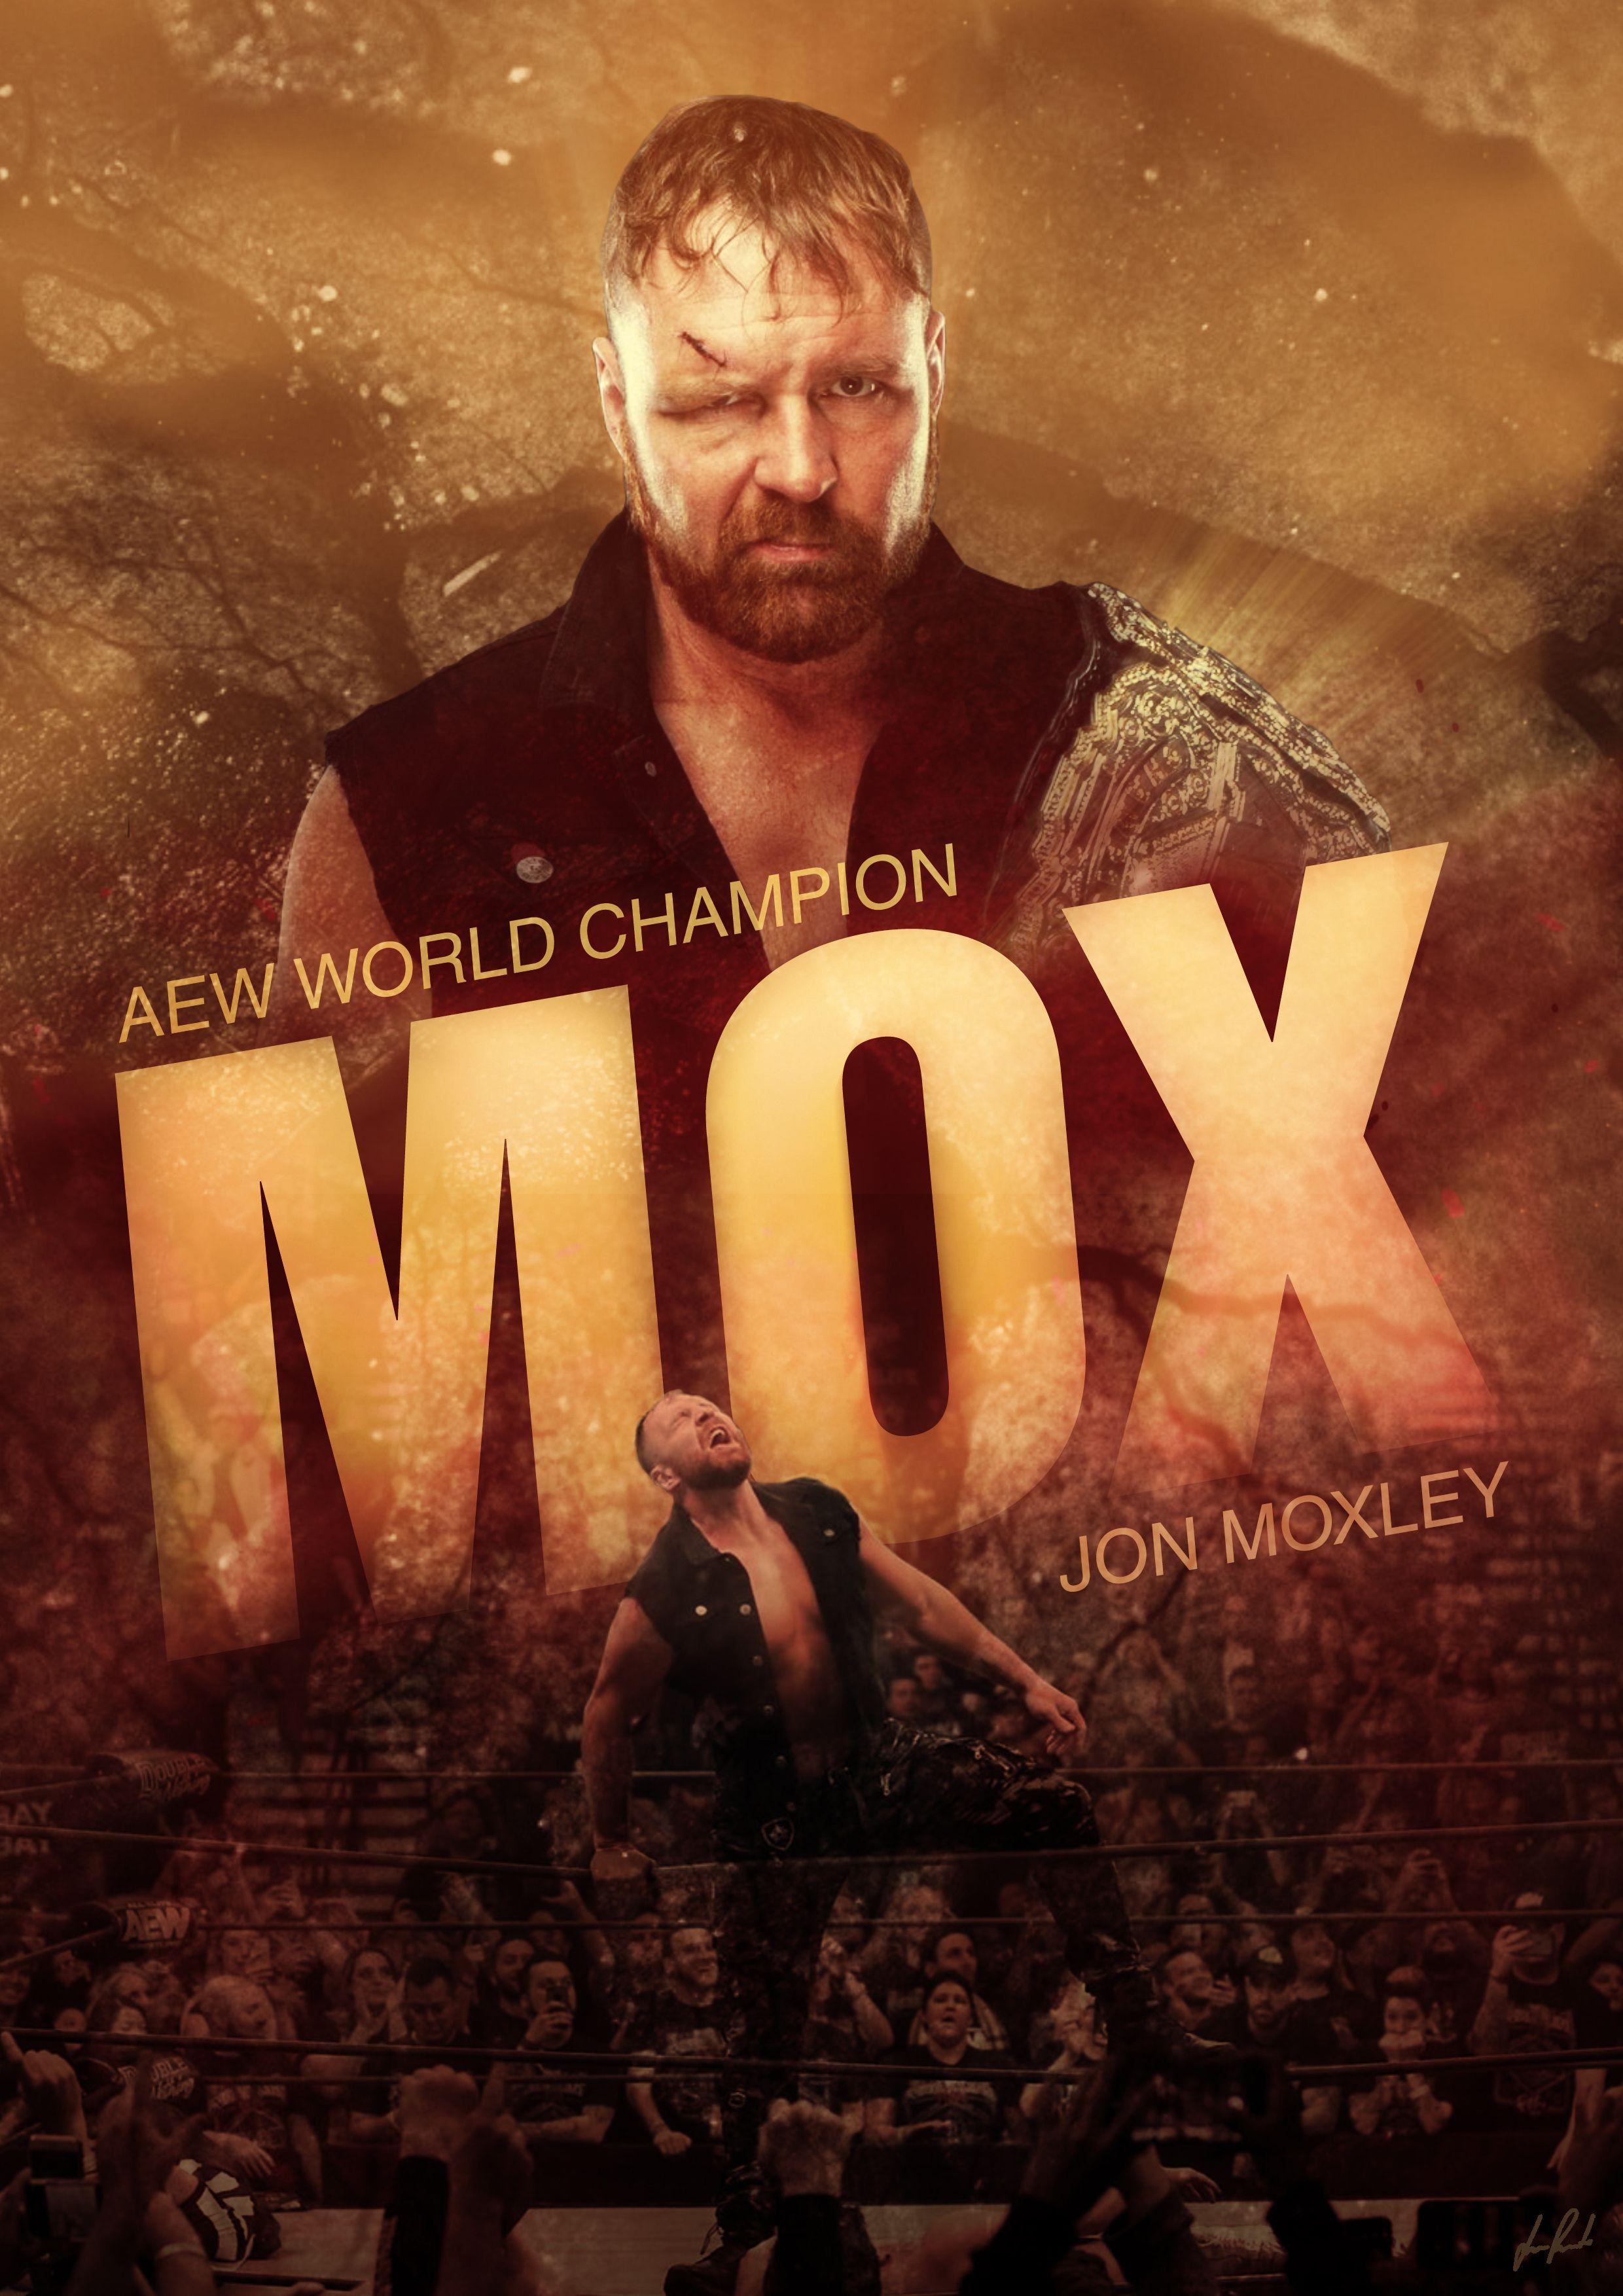 Aew Jon Moxley Jonmoxley Mox Moxley Aew Deanambrose Wwe Theshield Prowrestling Wrestling Wallpapers Photoshop Best Wrestlers Wrestling Wwe Divas